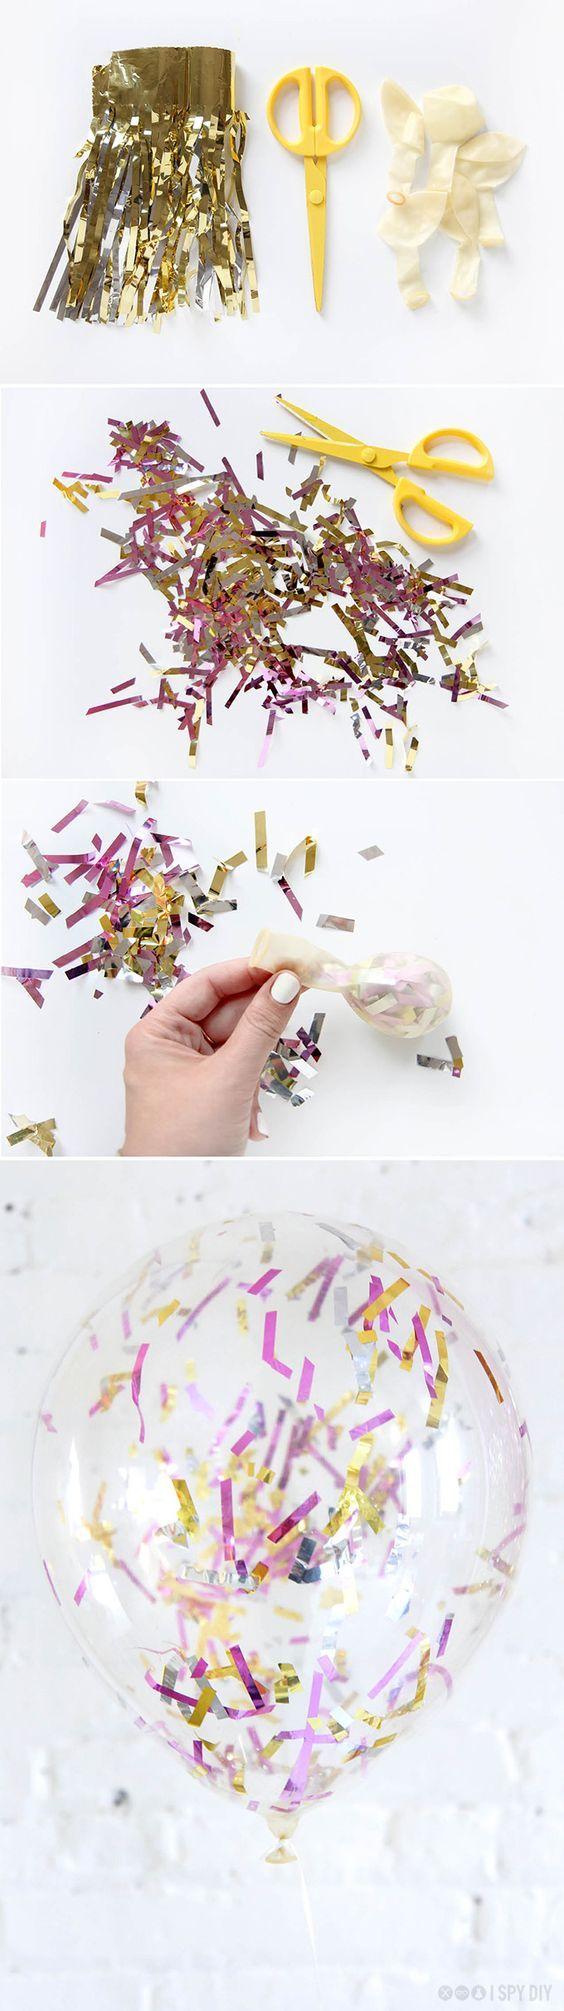 DIY Confetti Balloon Tutorial